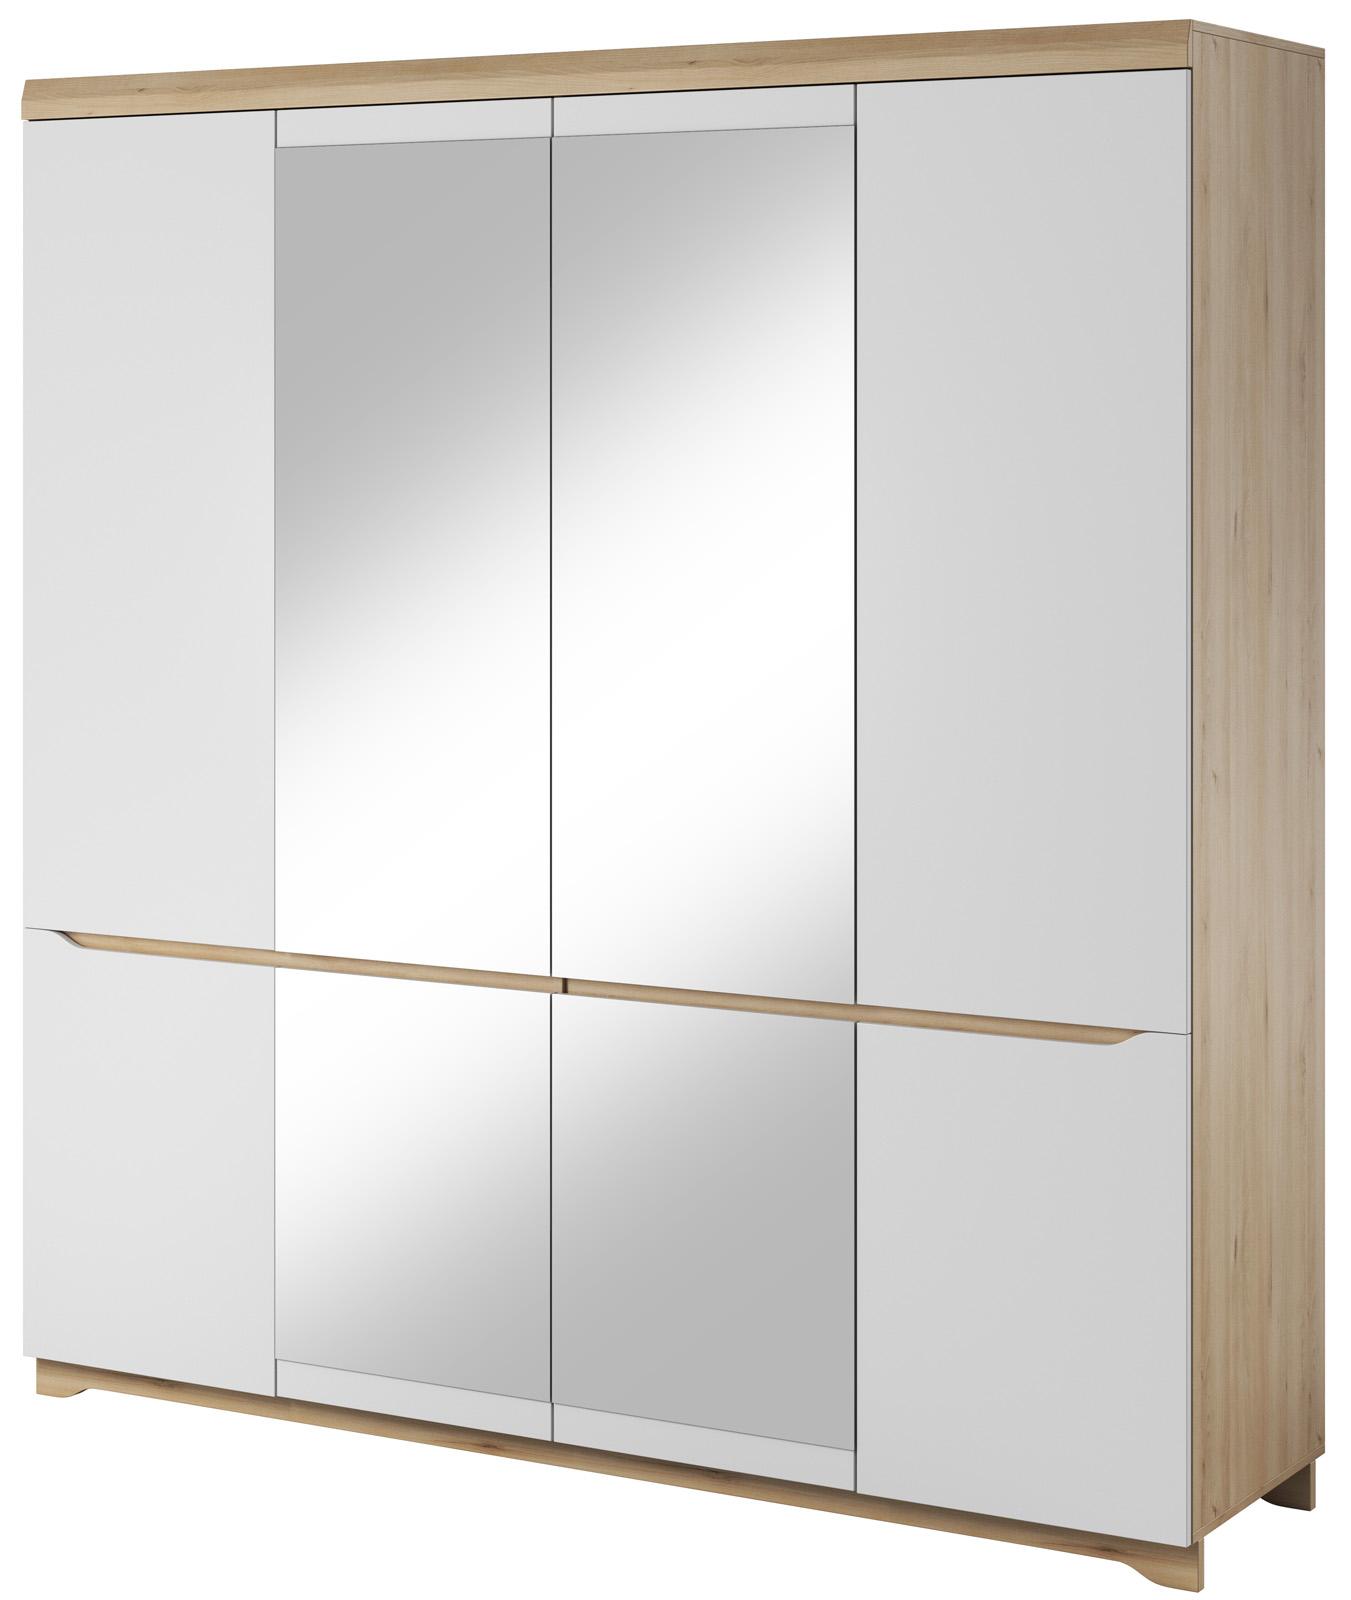 Šatní skříň bílá se zrcadly Antonio